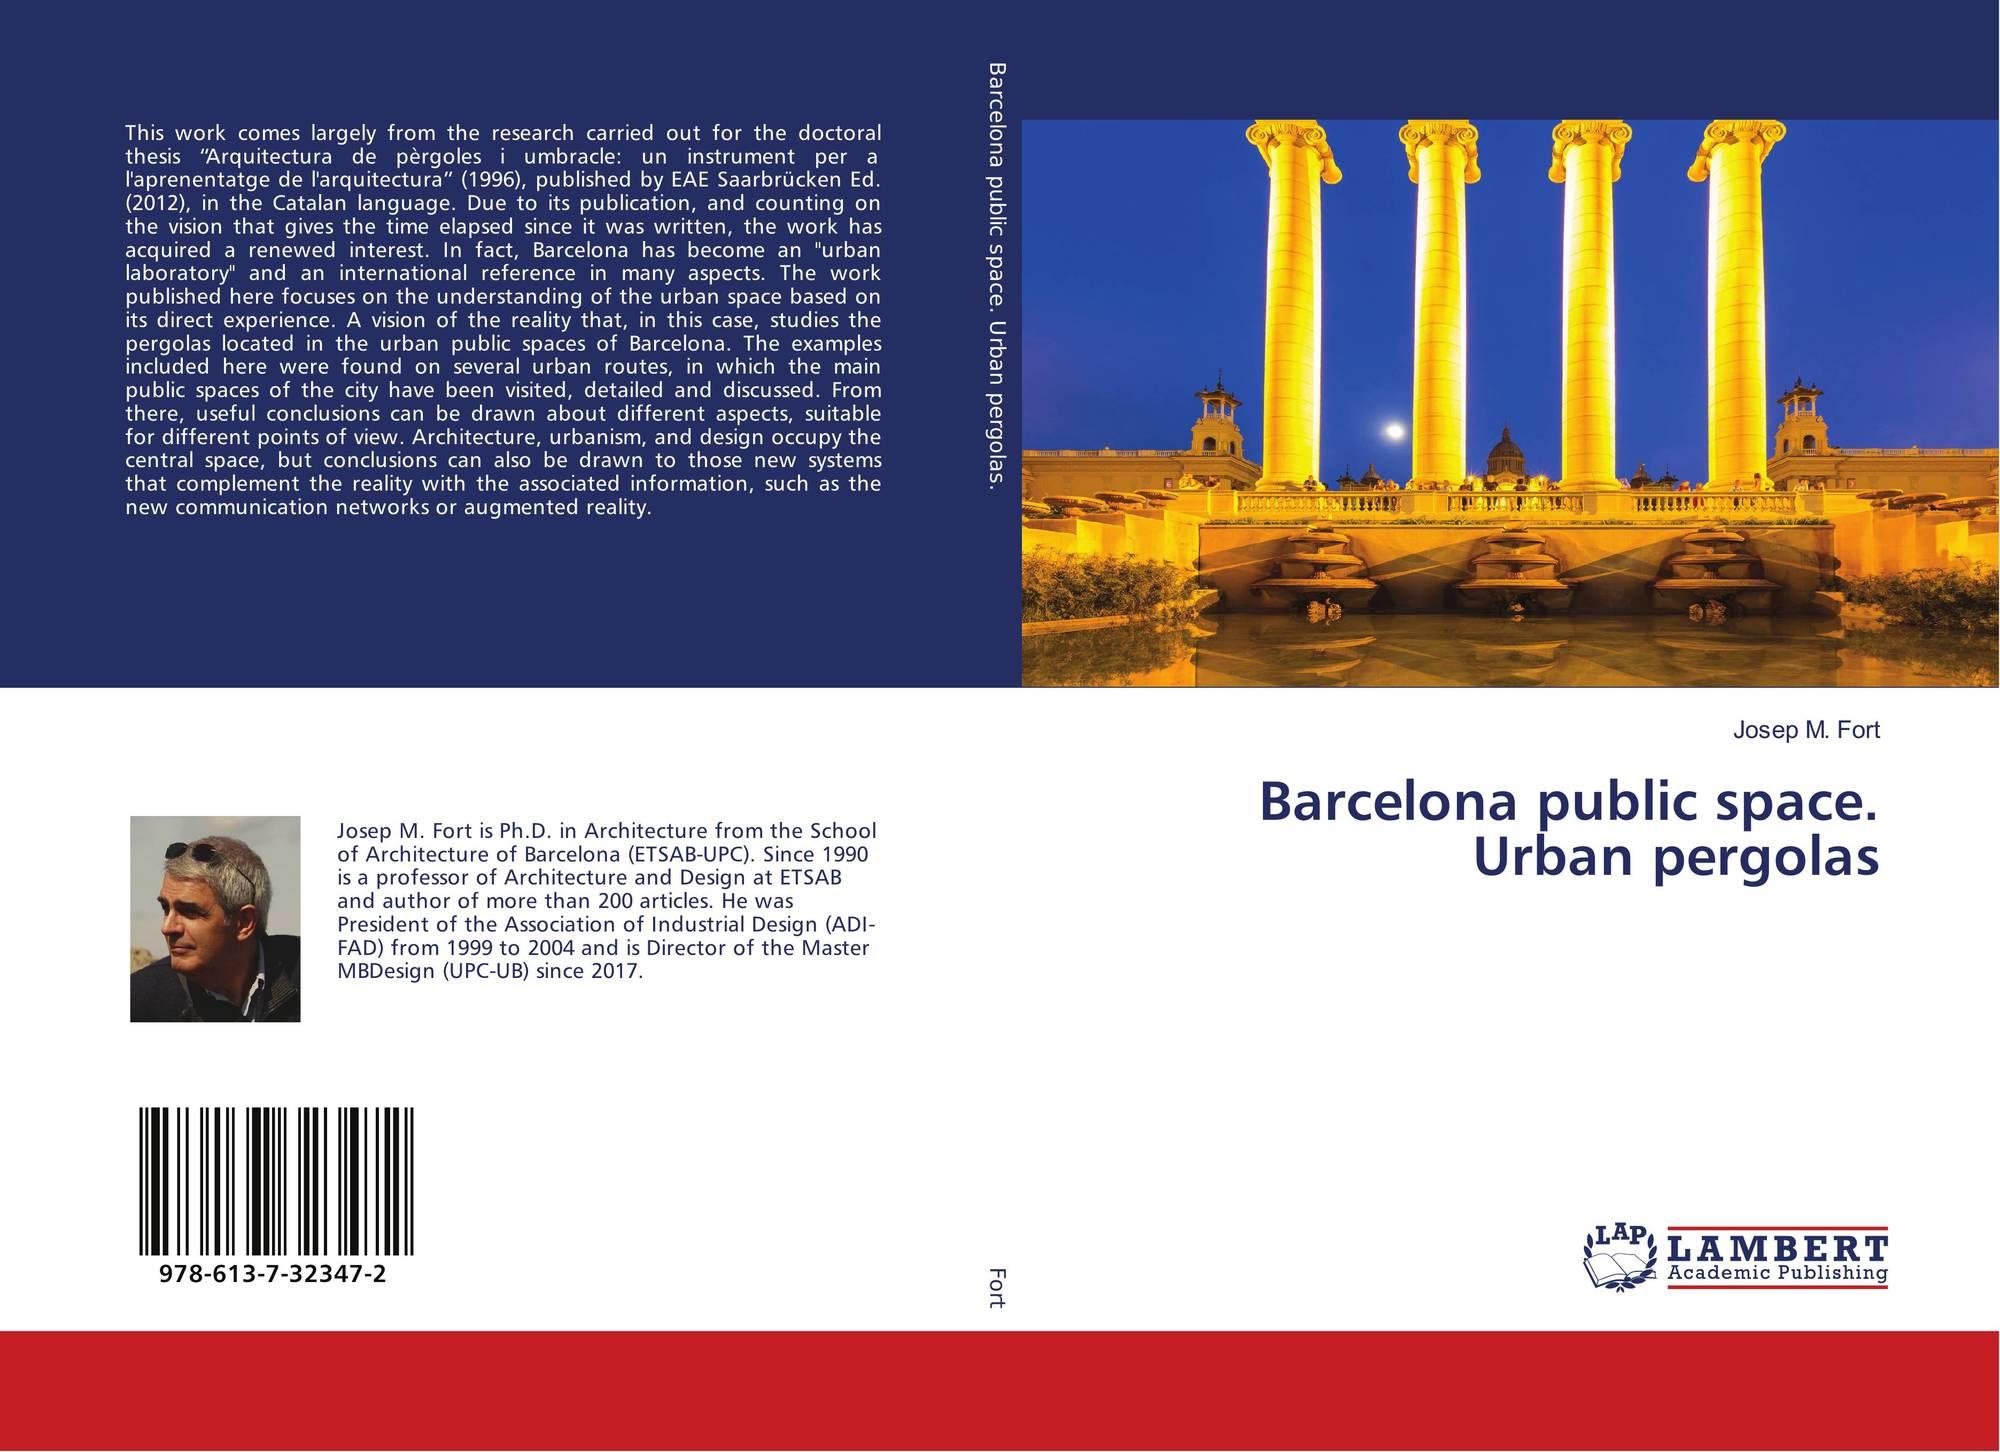 Barcelona public space  Urban pergolas, 978-613-7-32347-2